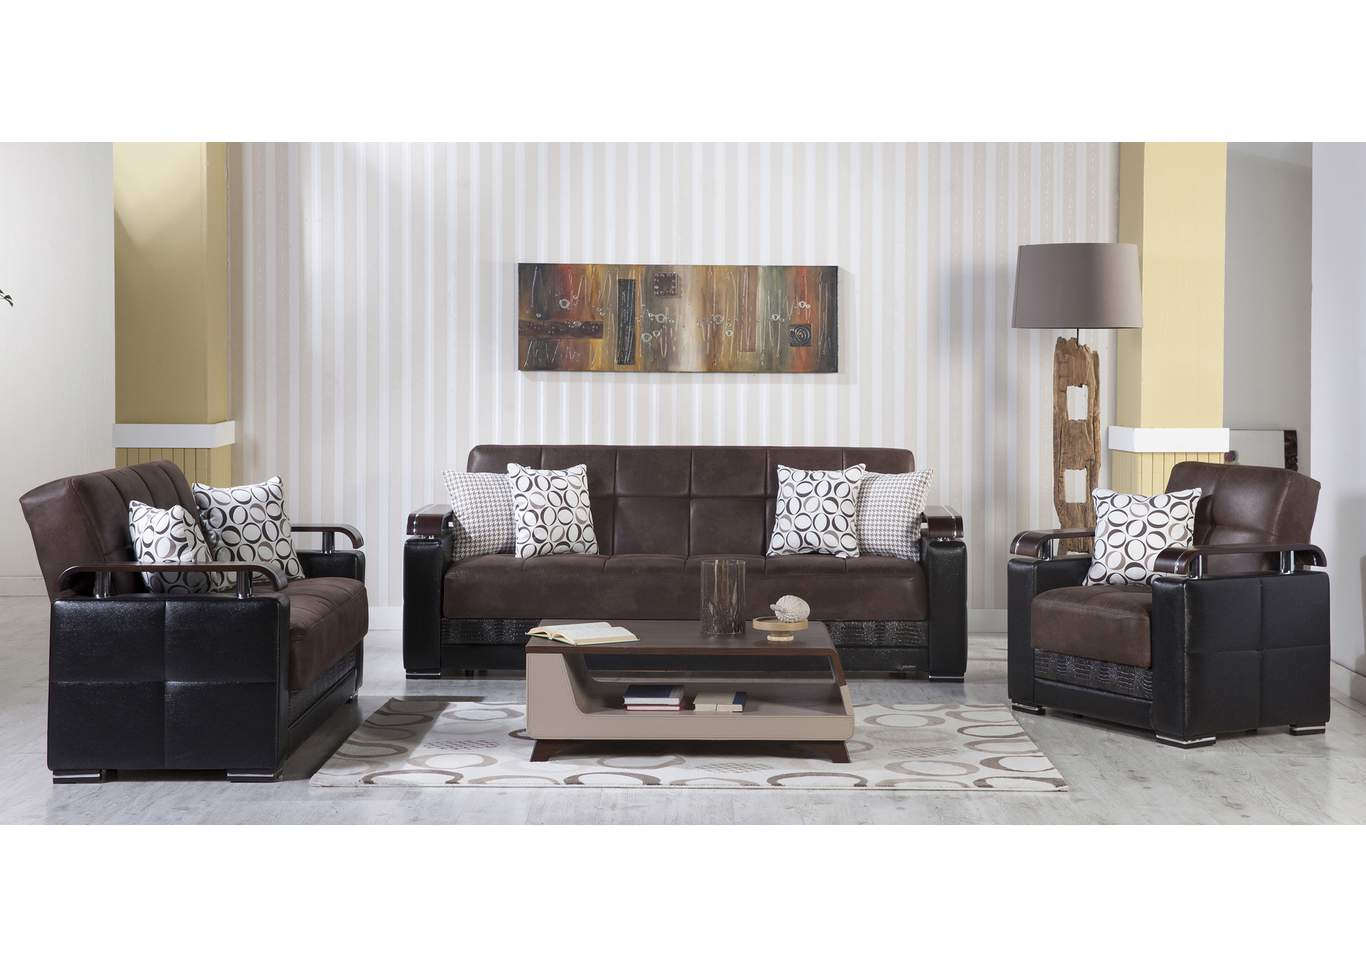 Pleasing Charisma Furniture Ekol Silverado Chocolate Sofa Loveseat Beatyapartments Chair Design Images Beatyapartmentscom